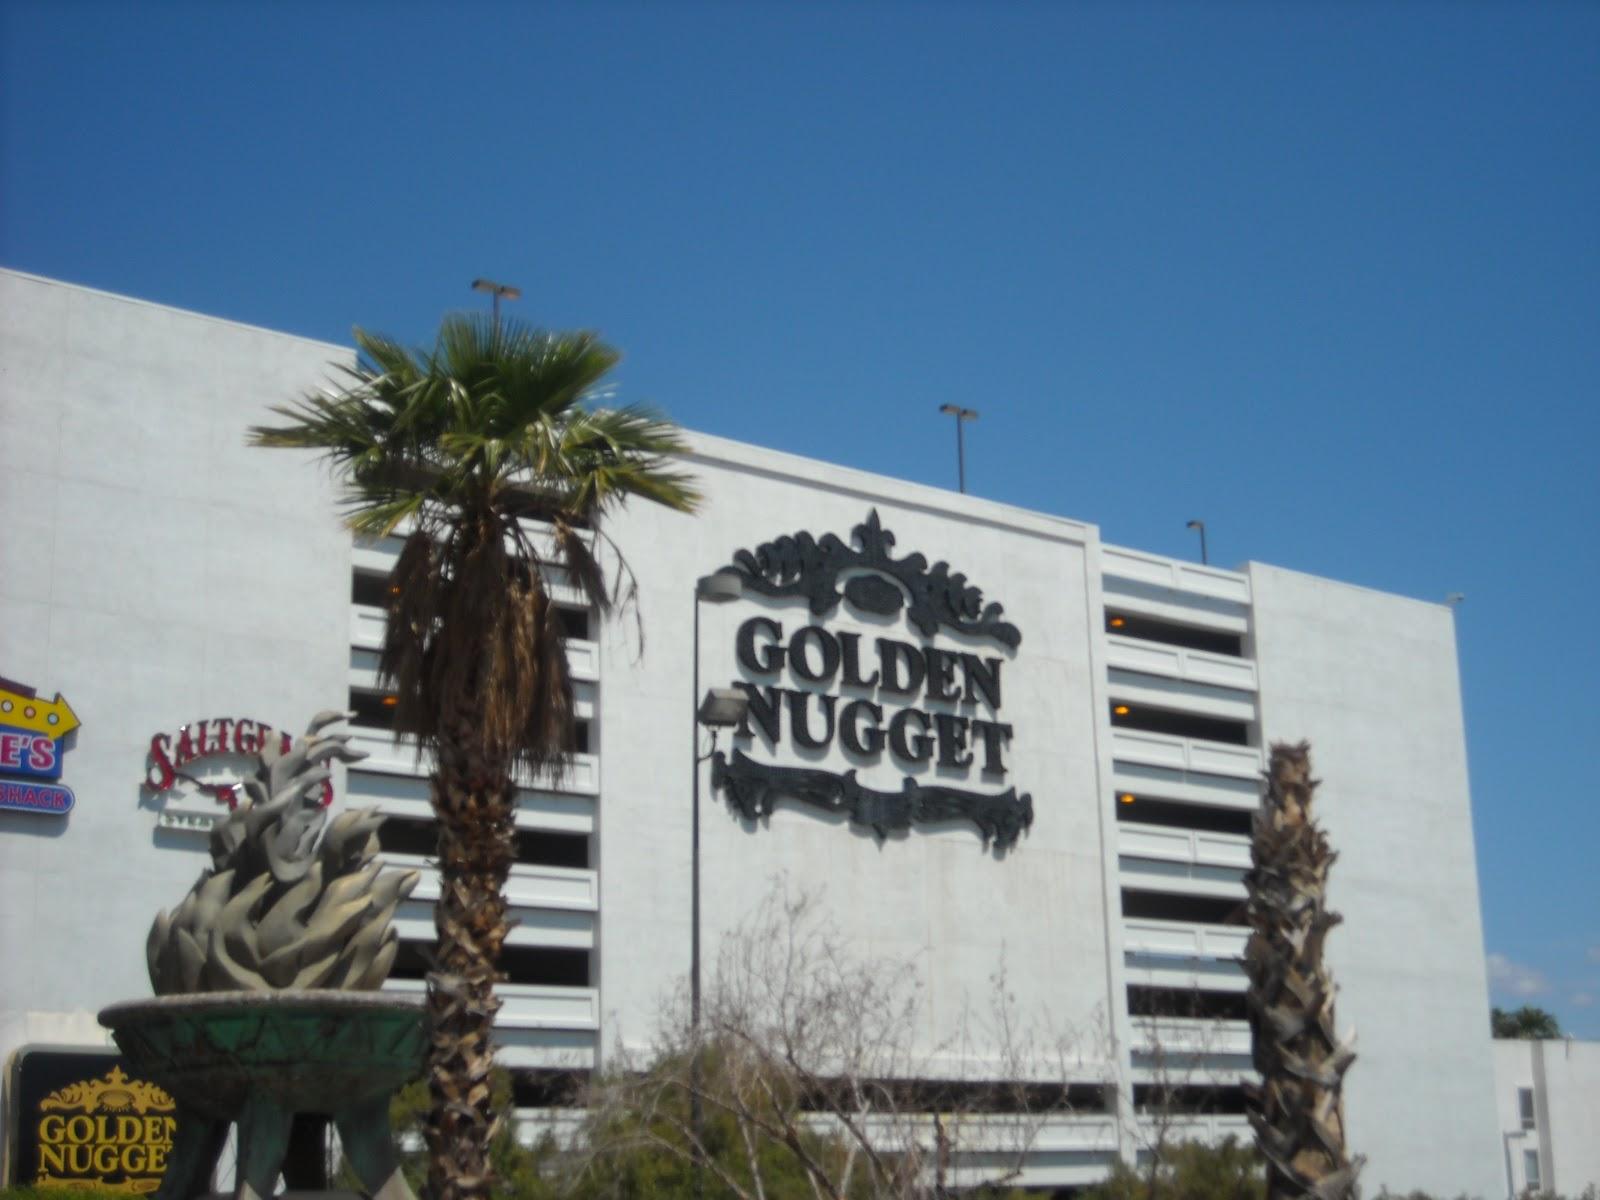 Beau rivage casino hotel reviews 16